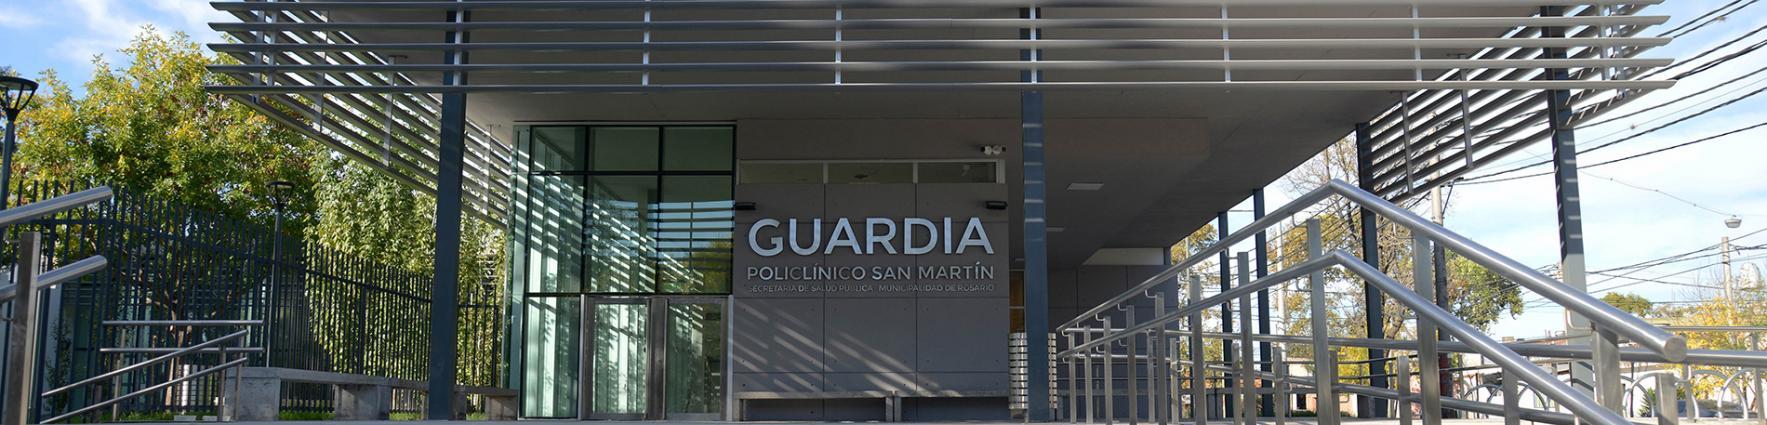 Policlínico San Martín